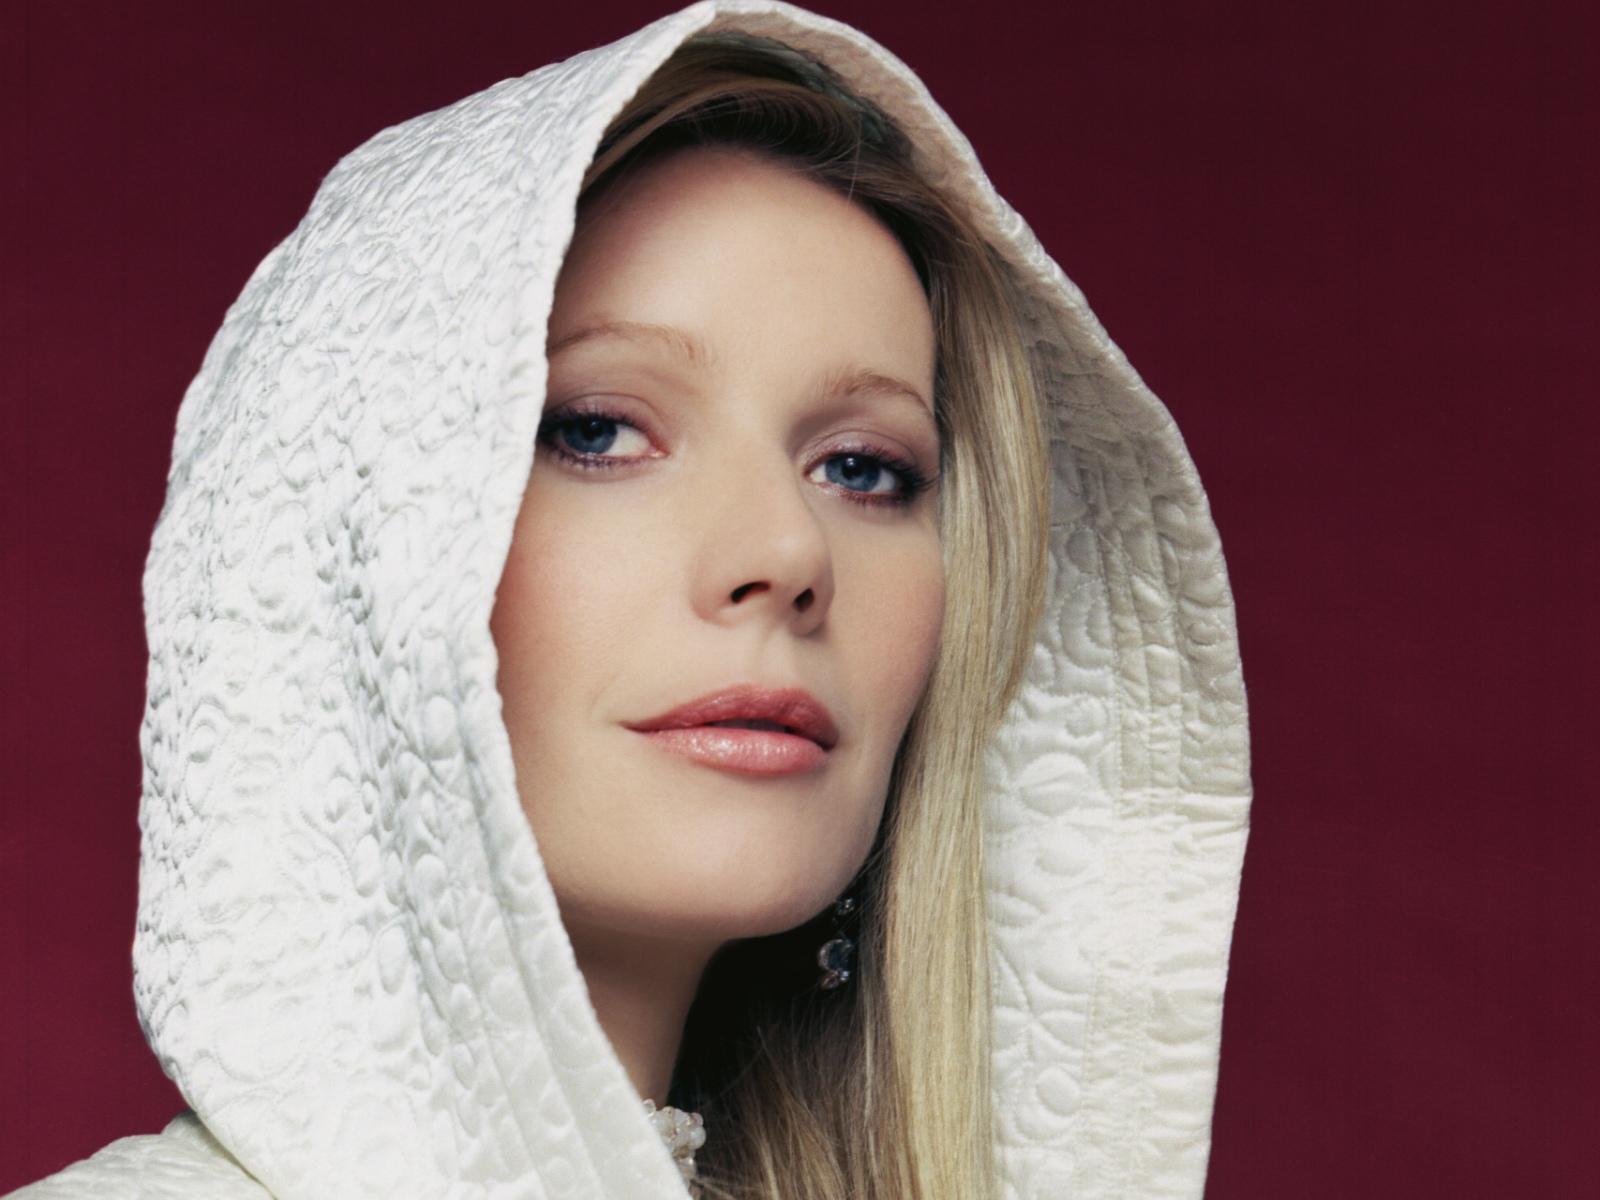 http://2.bp.blogspot.com/-eT0-jaA_t2Q/UDpFaAH1MyI/AAAAAAAAHtE/nA09Kjk0Z1c/s1600/Gwyneth-Paltrow-030.jpg